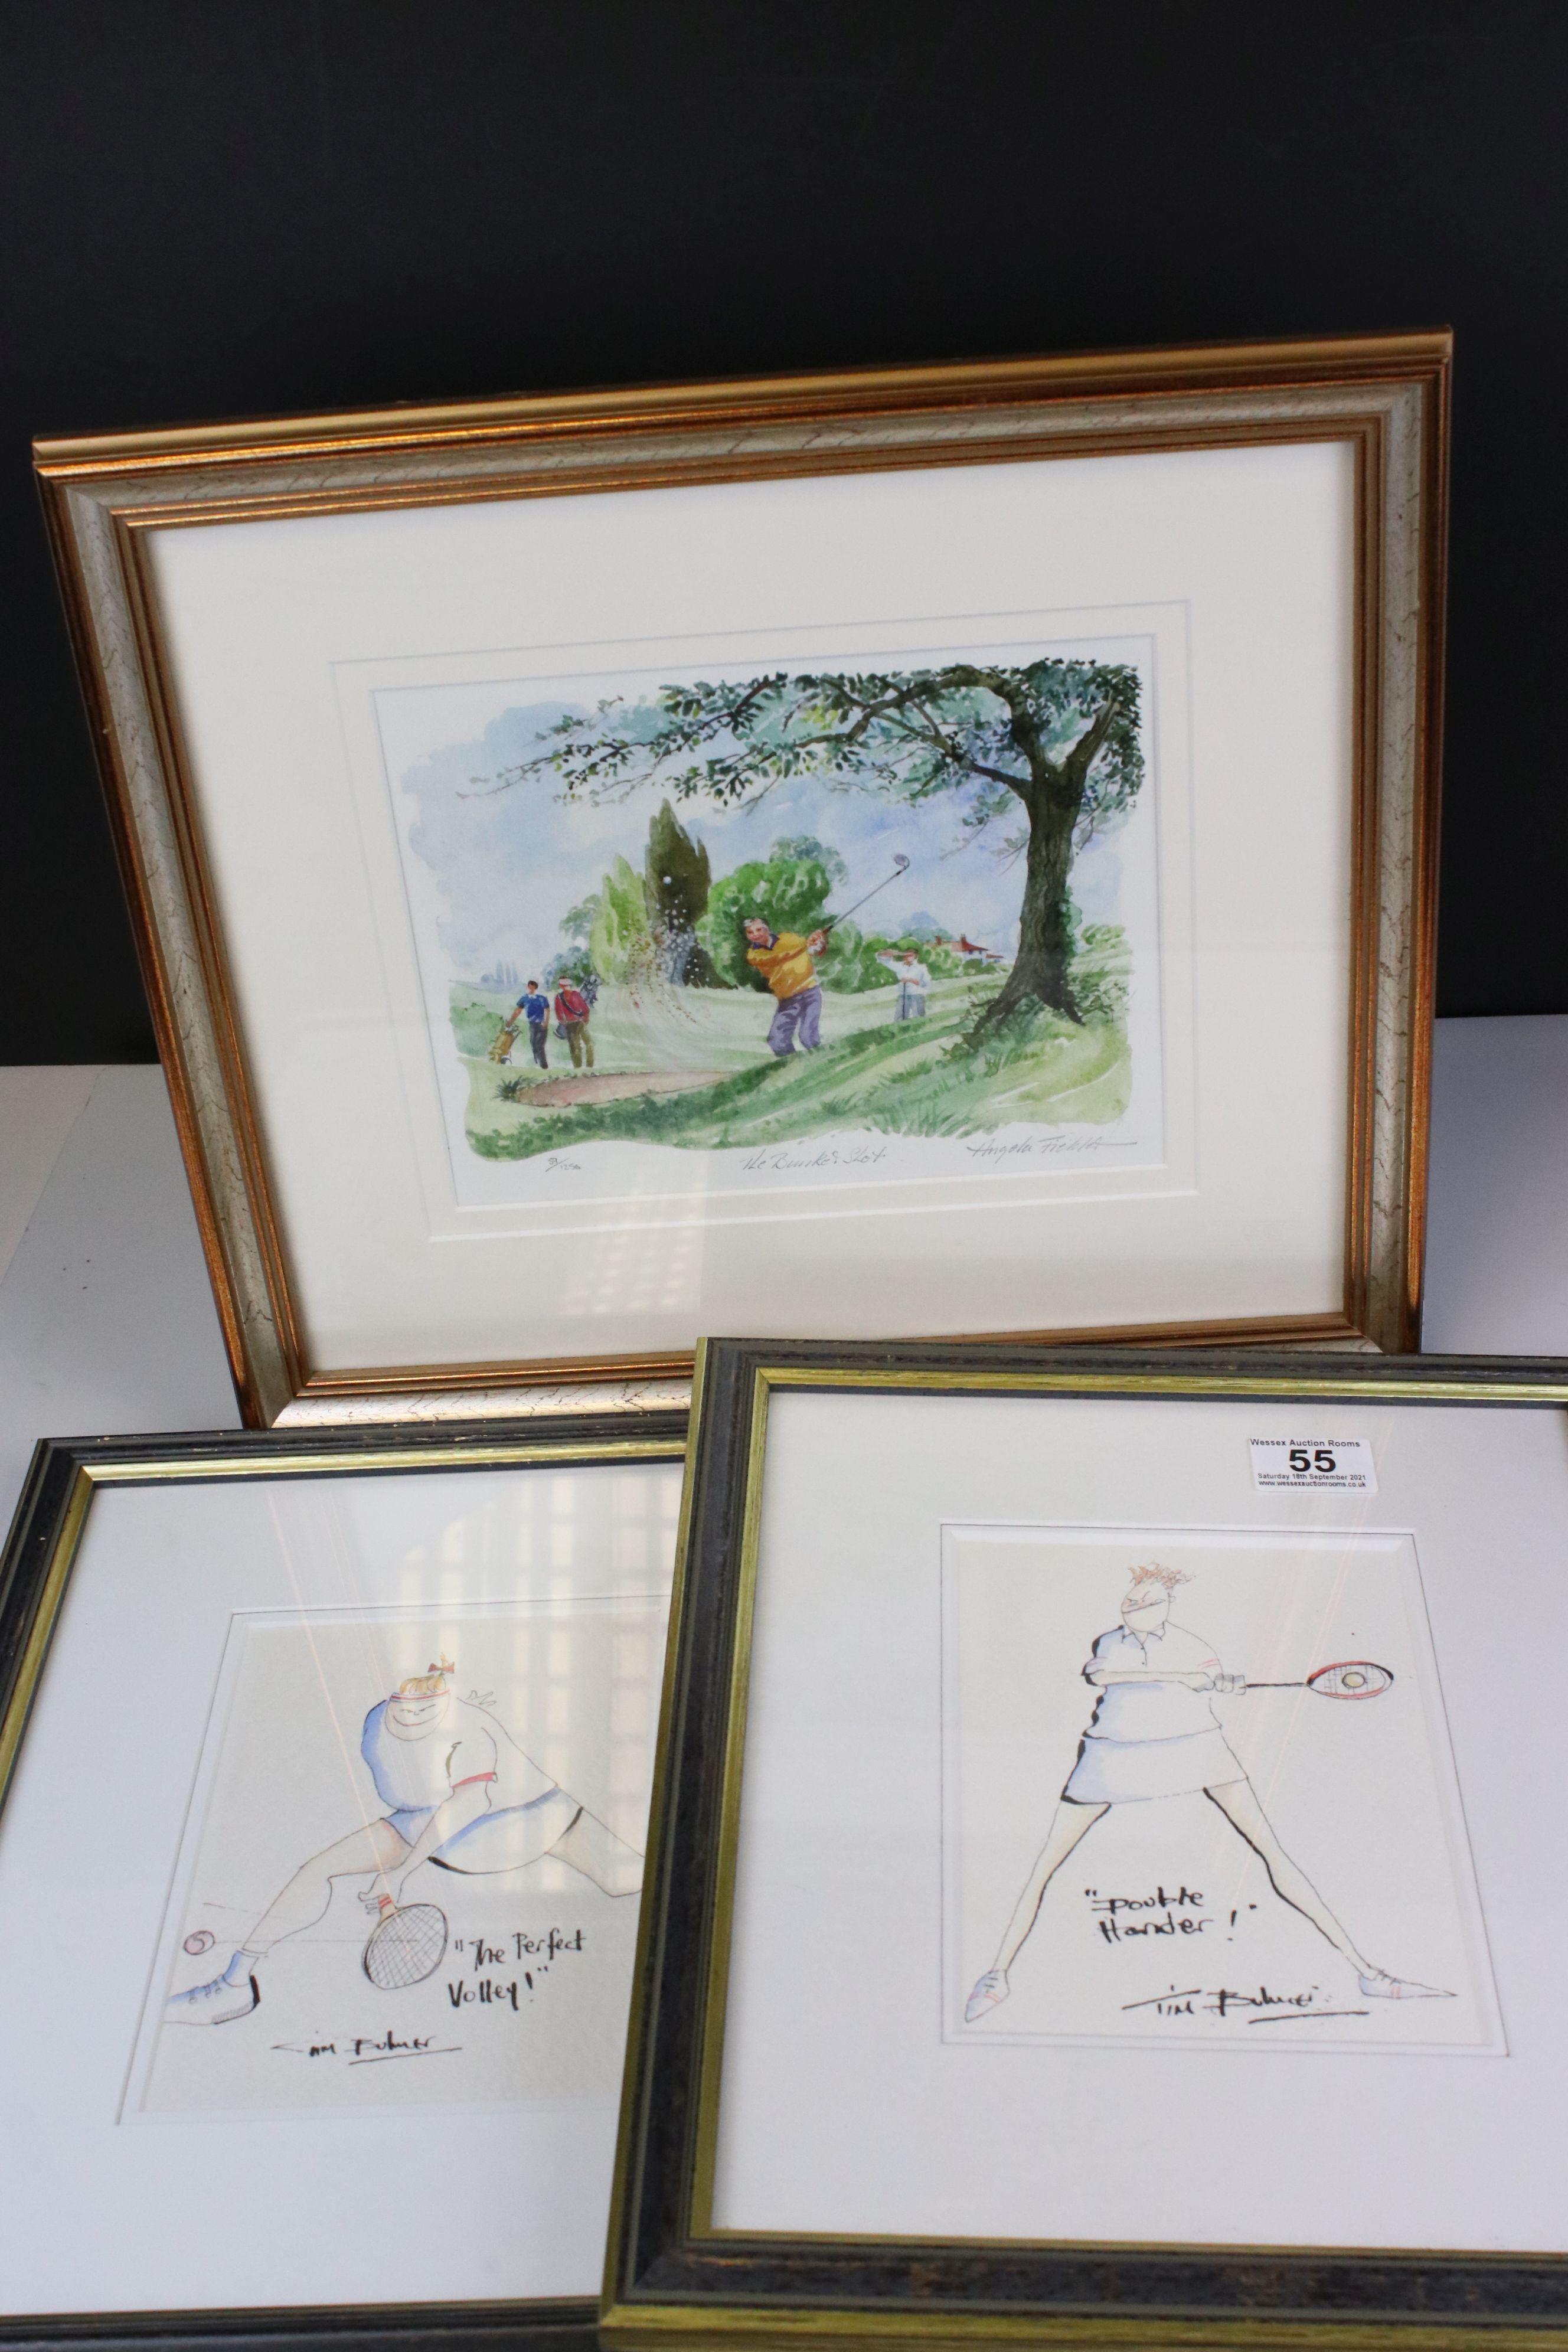 Tim Bulmer (cartoonist) a pair of humorous tennis watercolour cartoons & a signed Angela Fielder